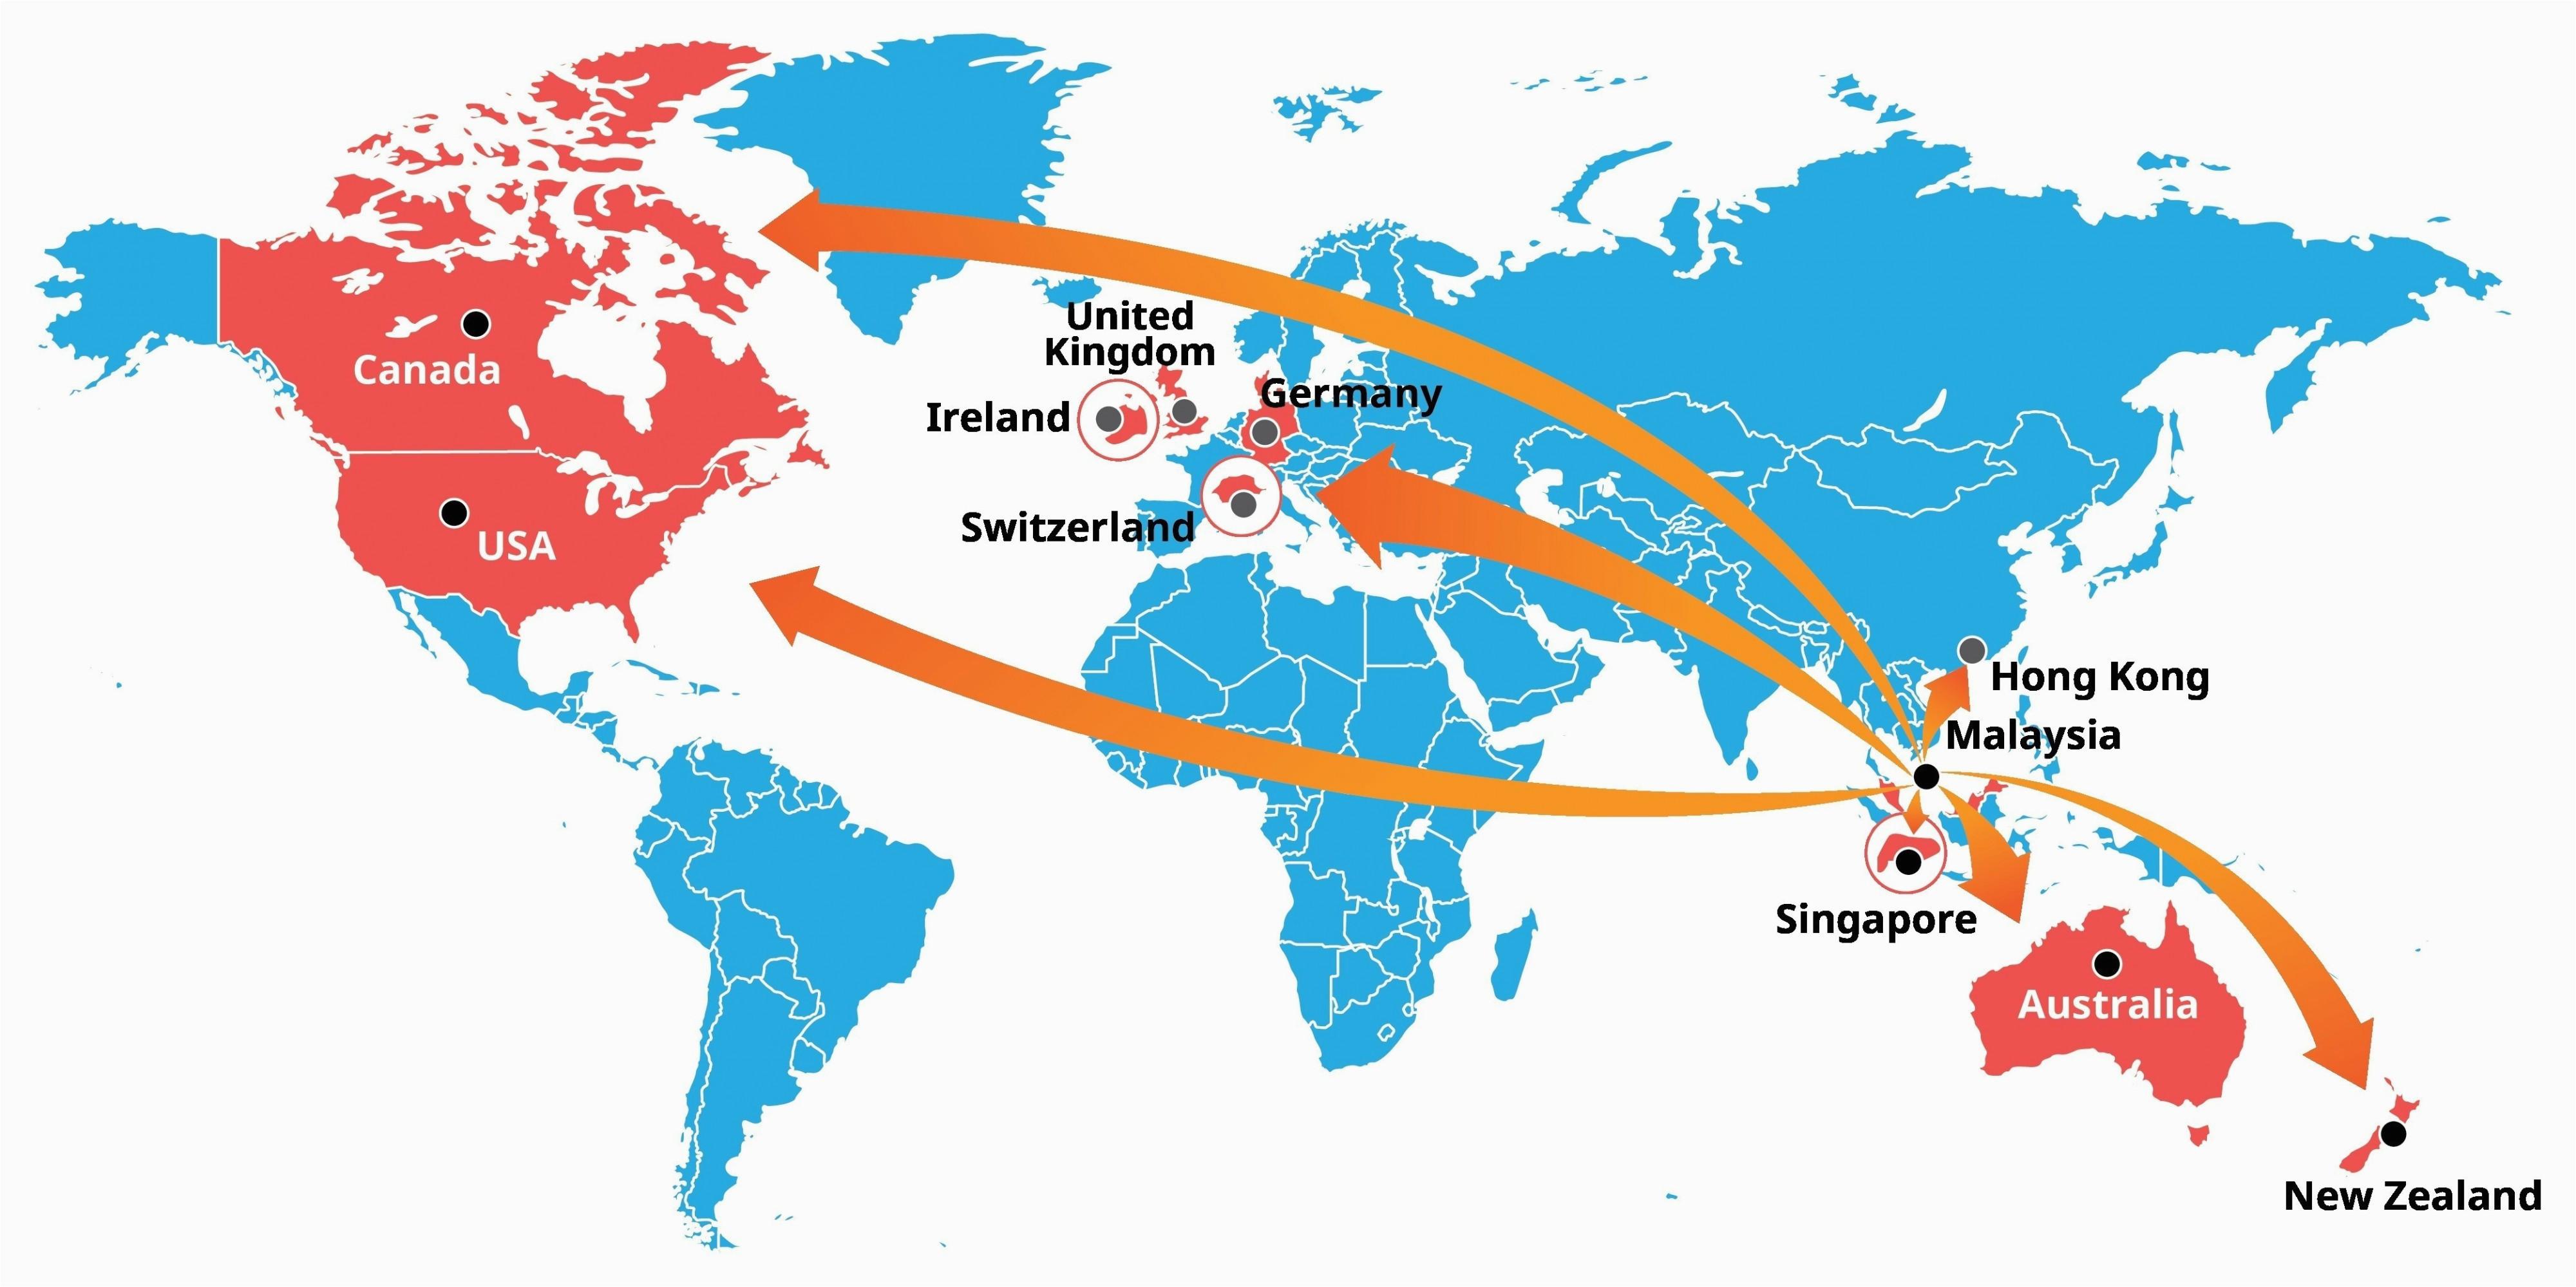 singapore location on world map climatejourney org